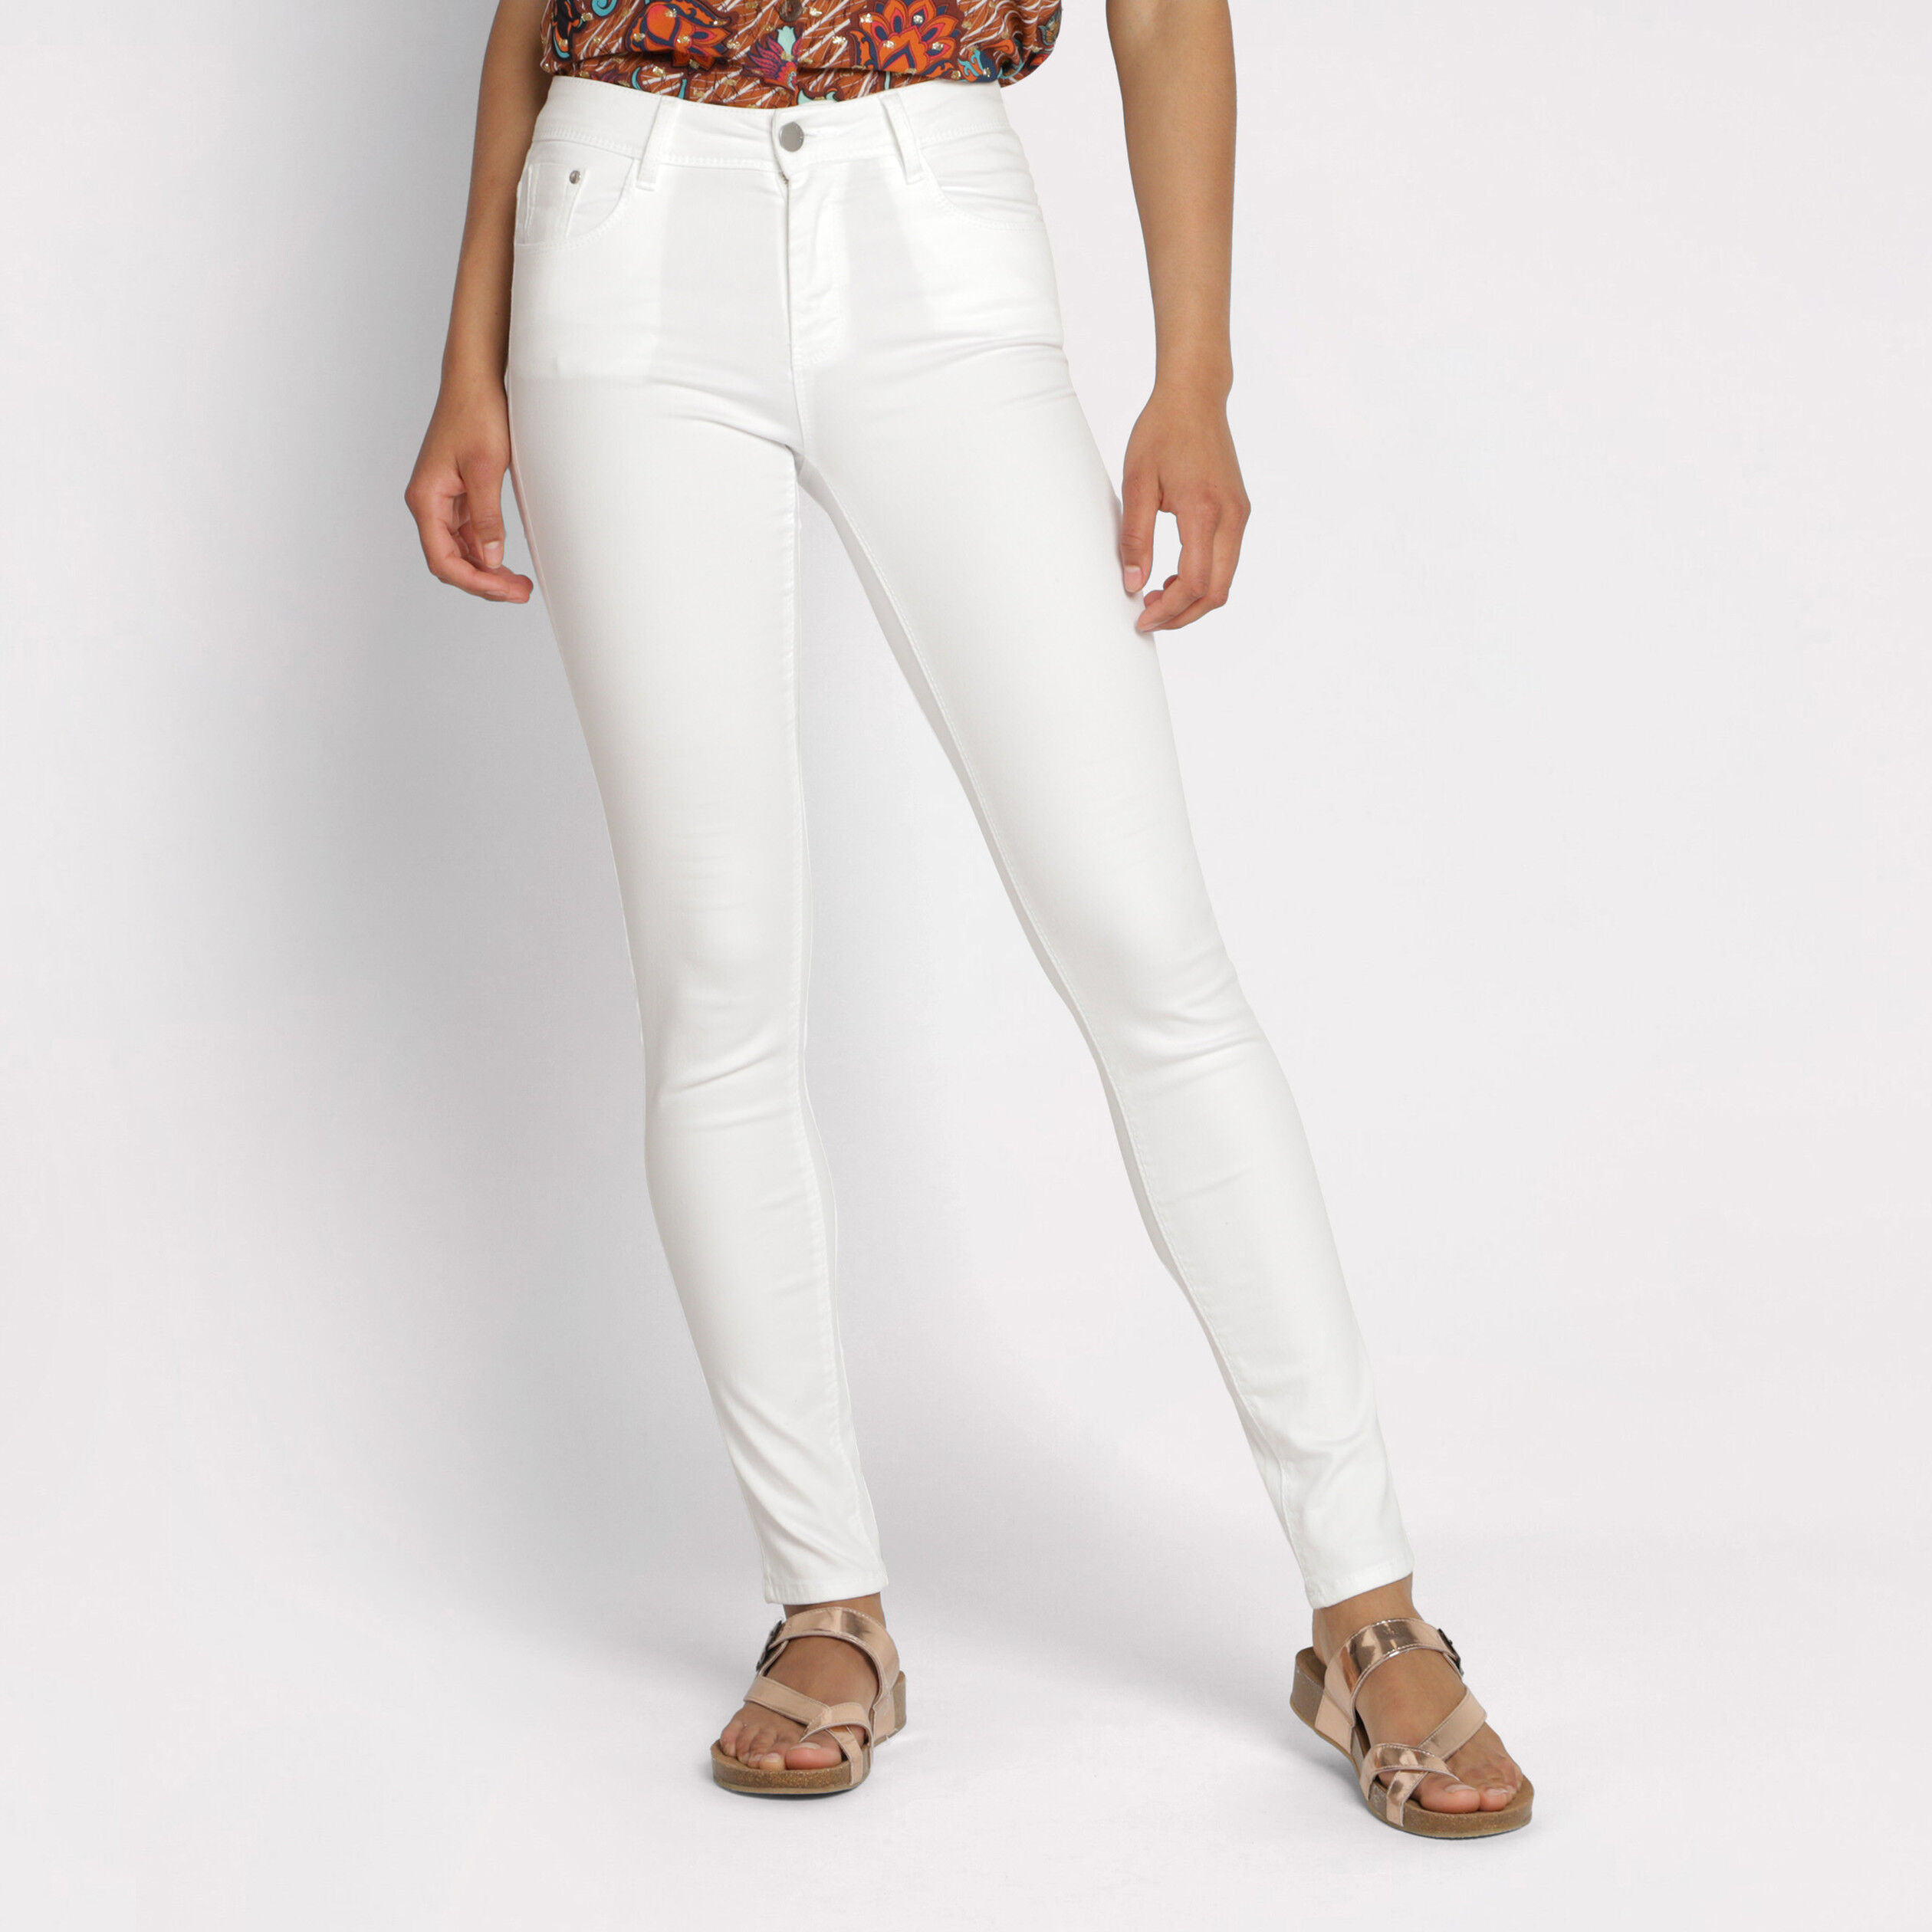 Pantalon Couleur Blanc Slim Femme Femme Slim Pantalon Slim Couleur Blanc Pantalon GUqSzVpM